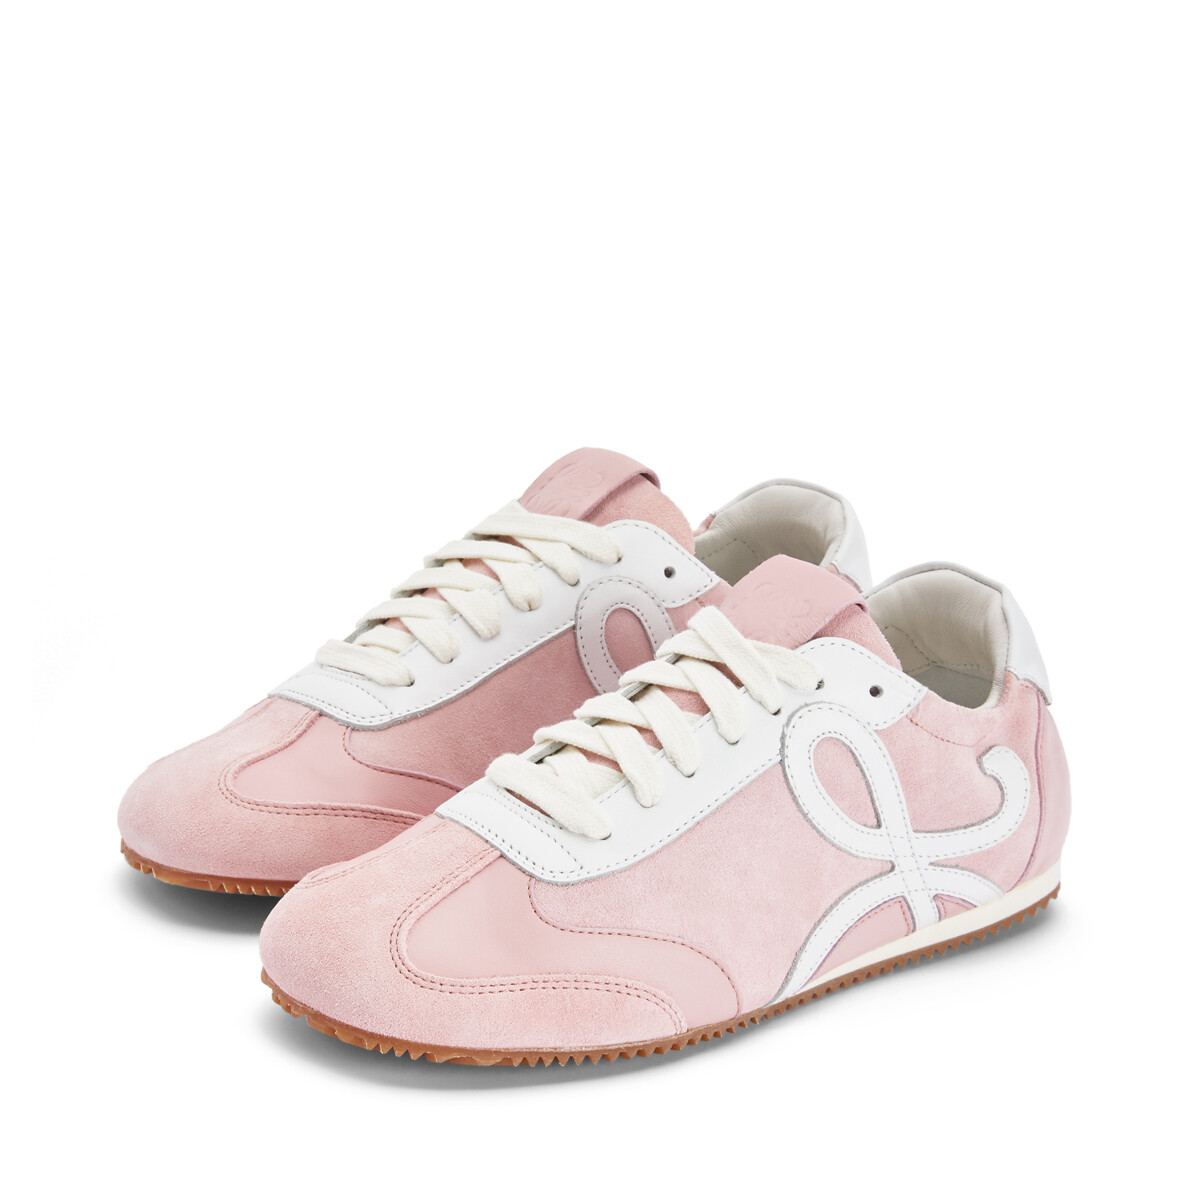 LOEWE Ballet Runner Pink/White front